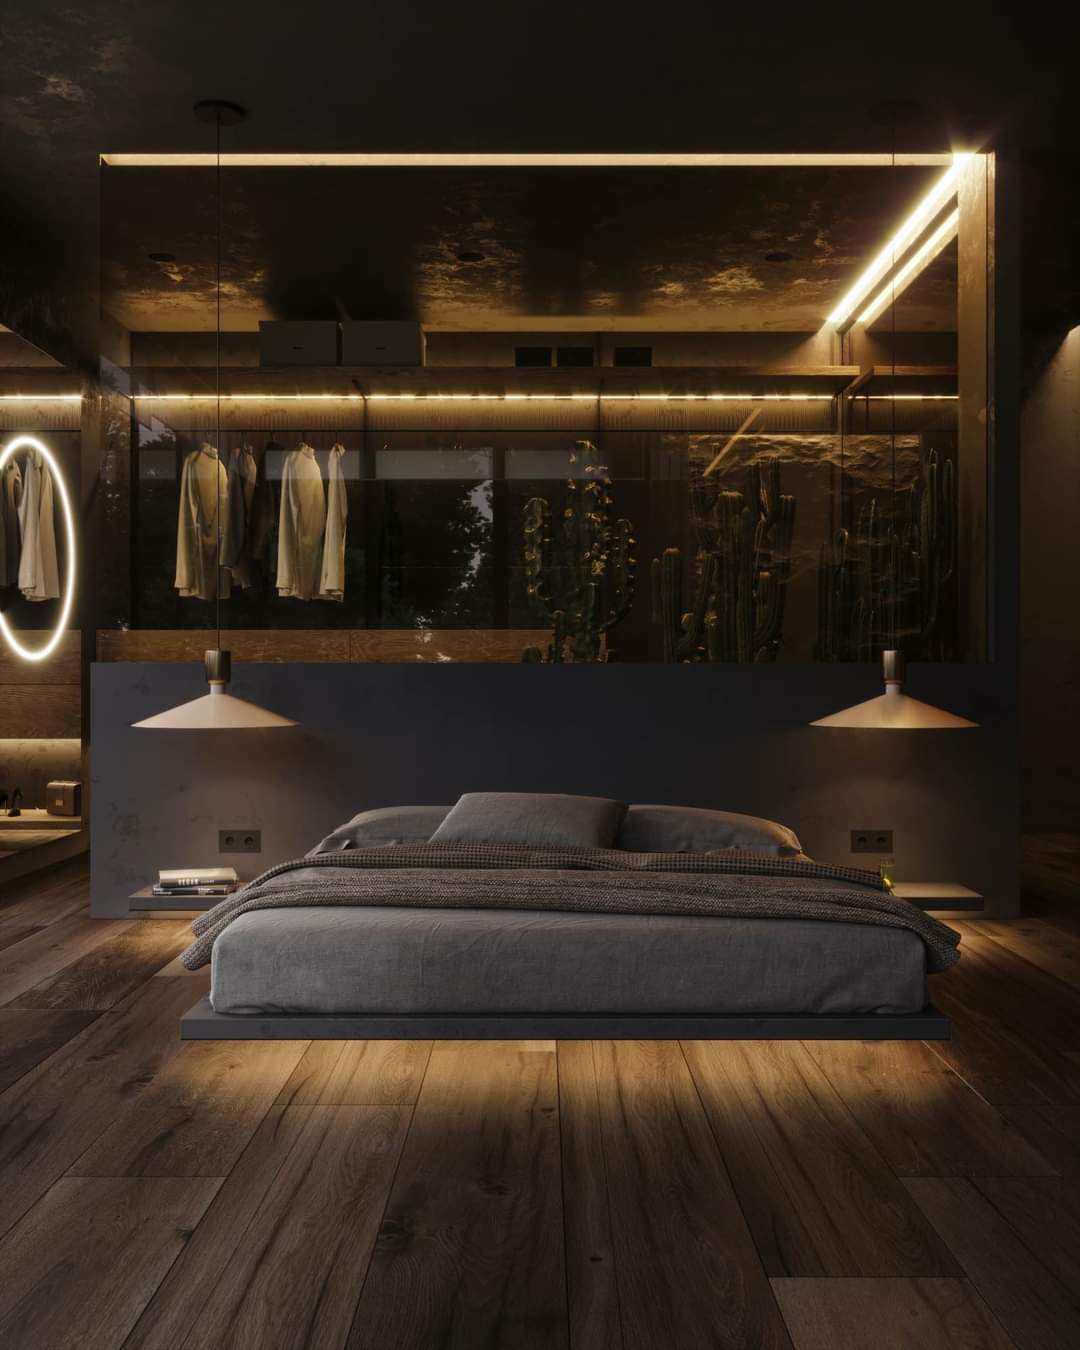 Striking Bedroom Set Up - Source: Kireevaaanna